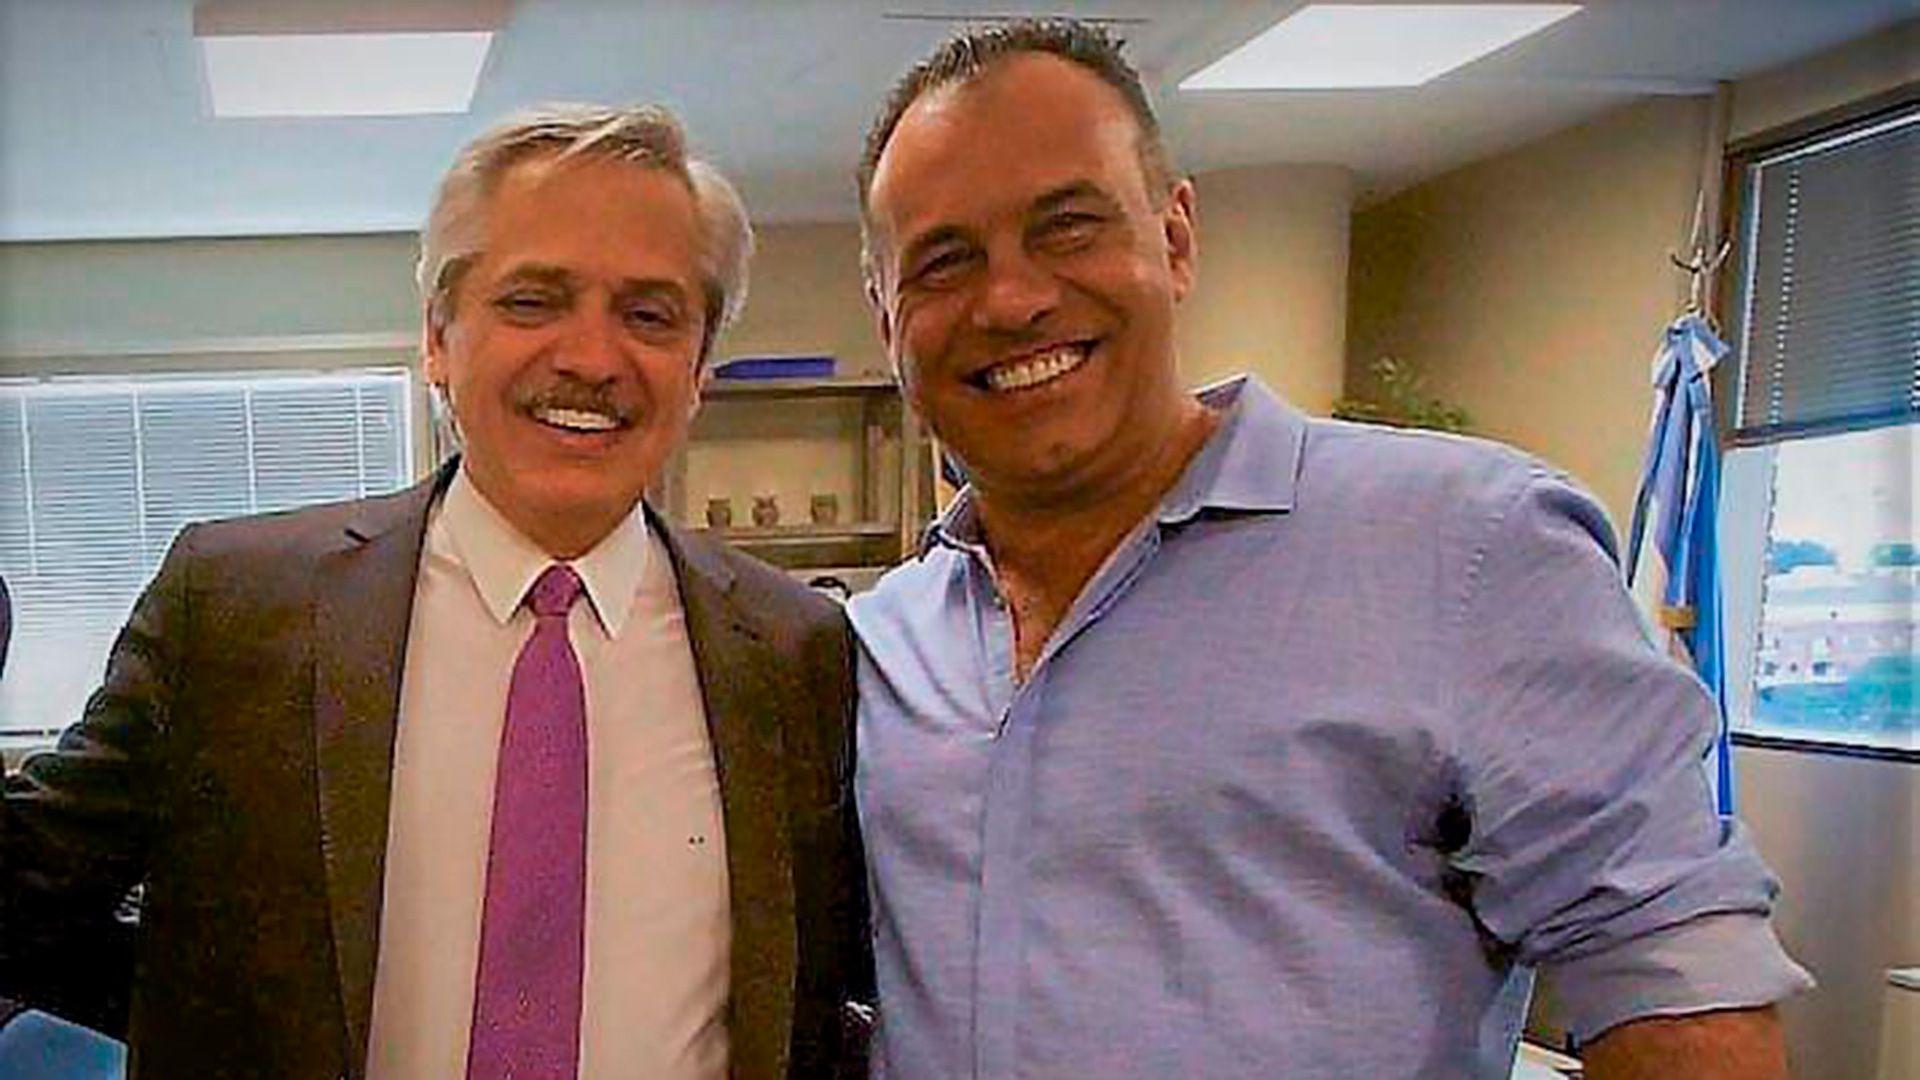 Daniel Capitanich embajador en Nicaragua alberto fernandez